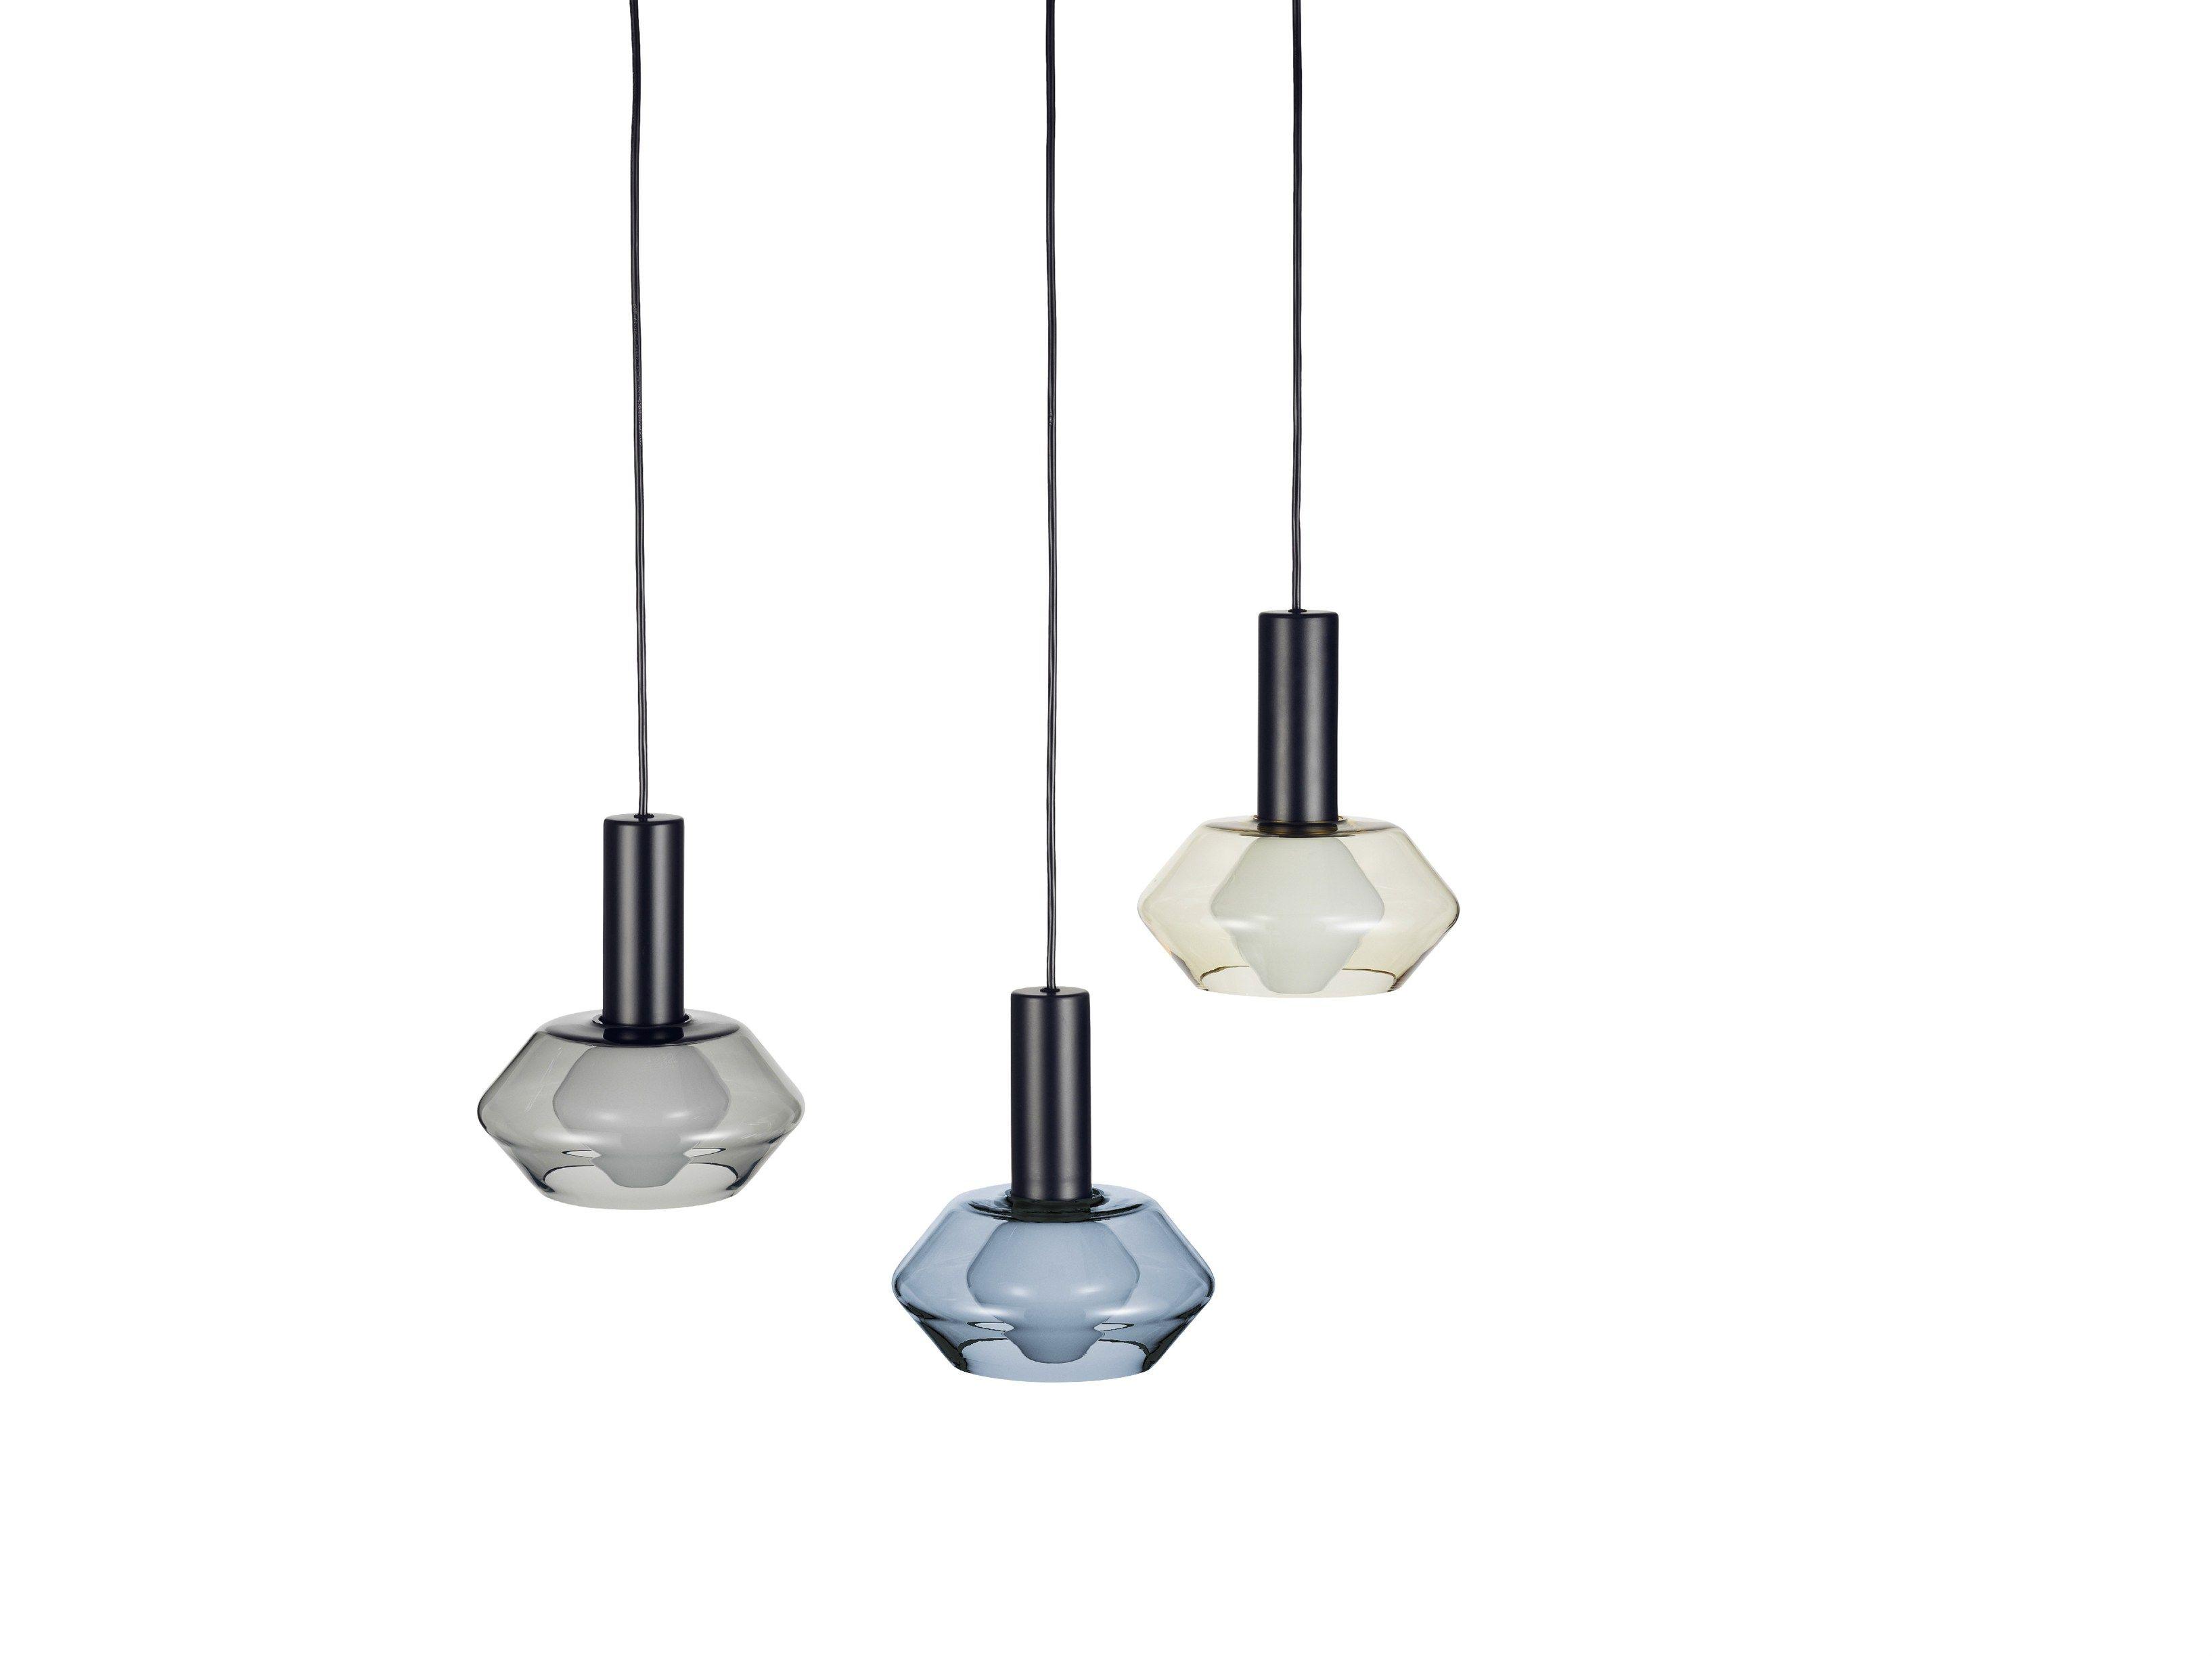 led metal pendant lamp tw003 glass shade pendant lamp artek artek lighting